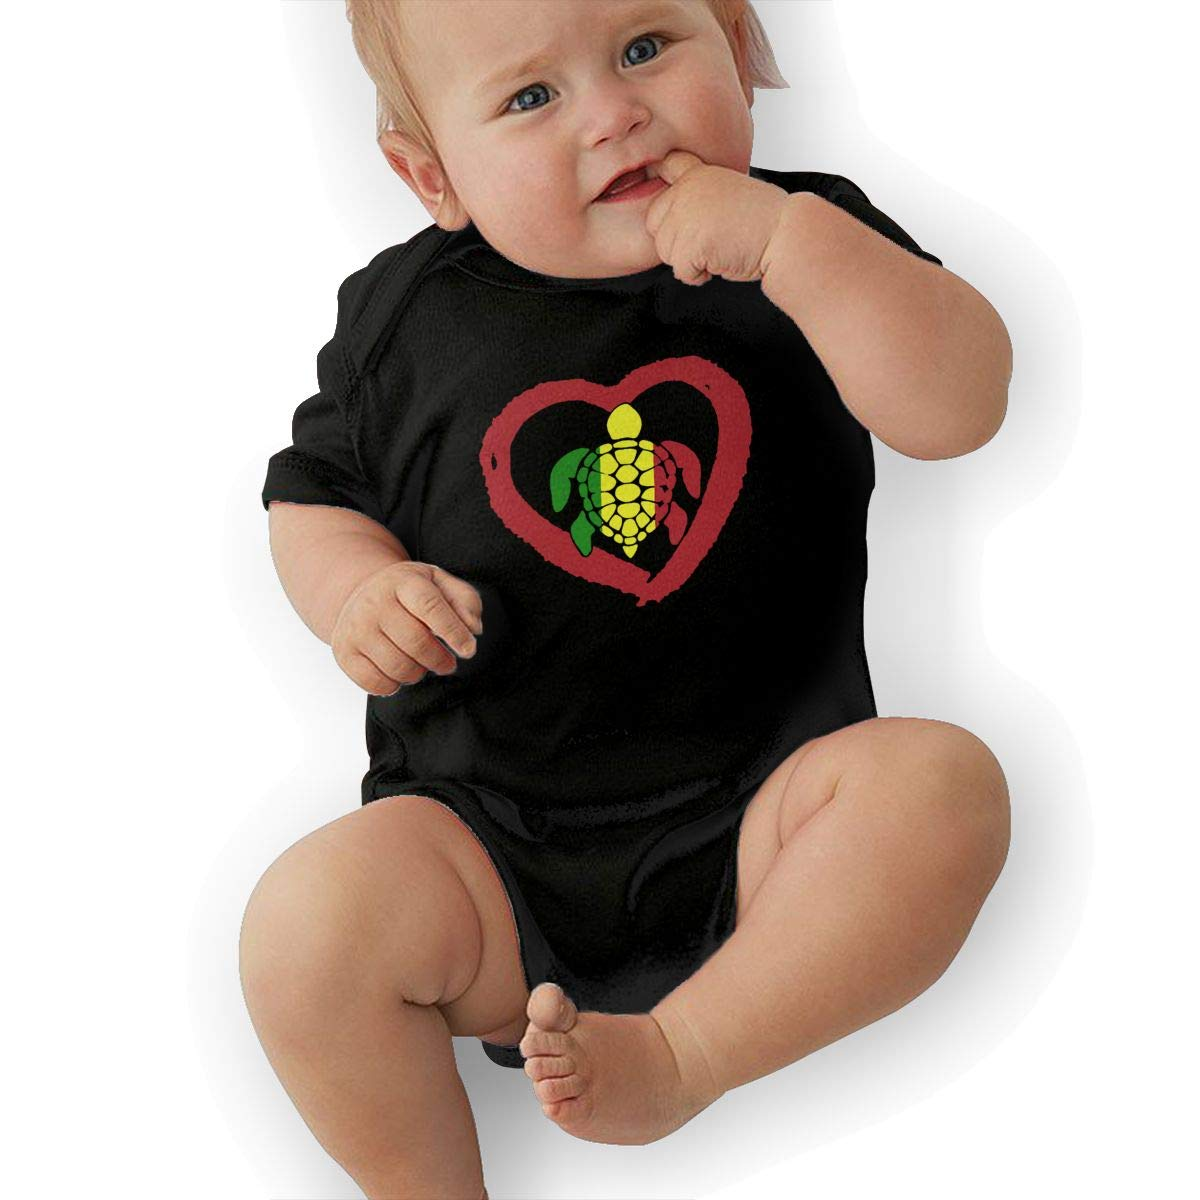 Soft Sea Turtle Rasta Reggae Heart Playsuit Short Sleeve Cotton Rompers for Baby Girls Boys